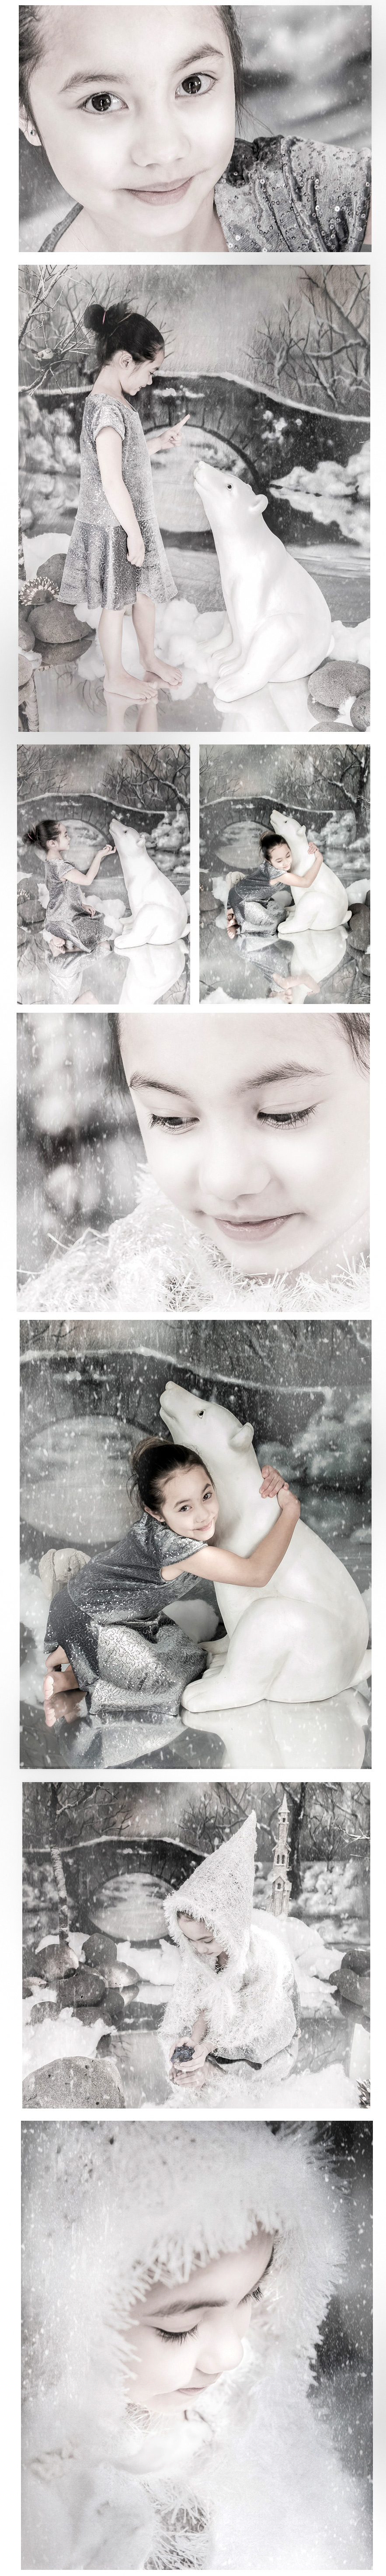 winter-wonderland-free-lense-photo.jpg